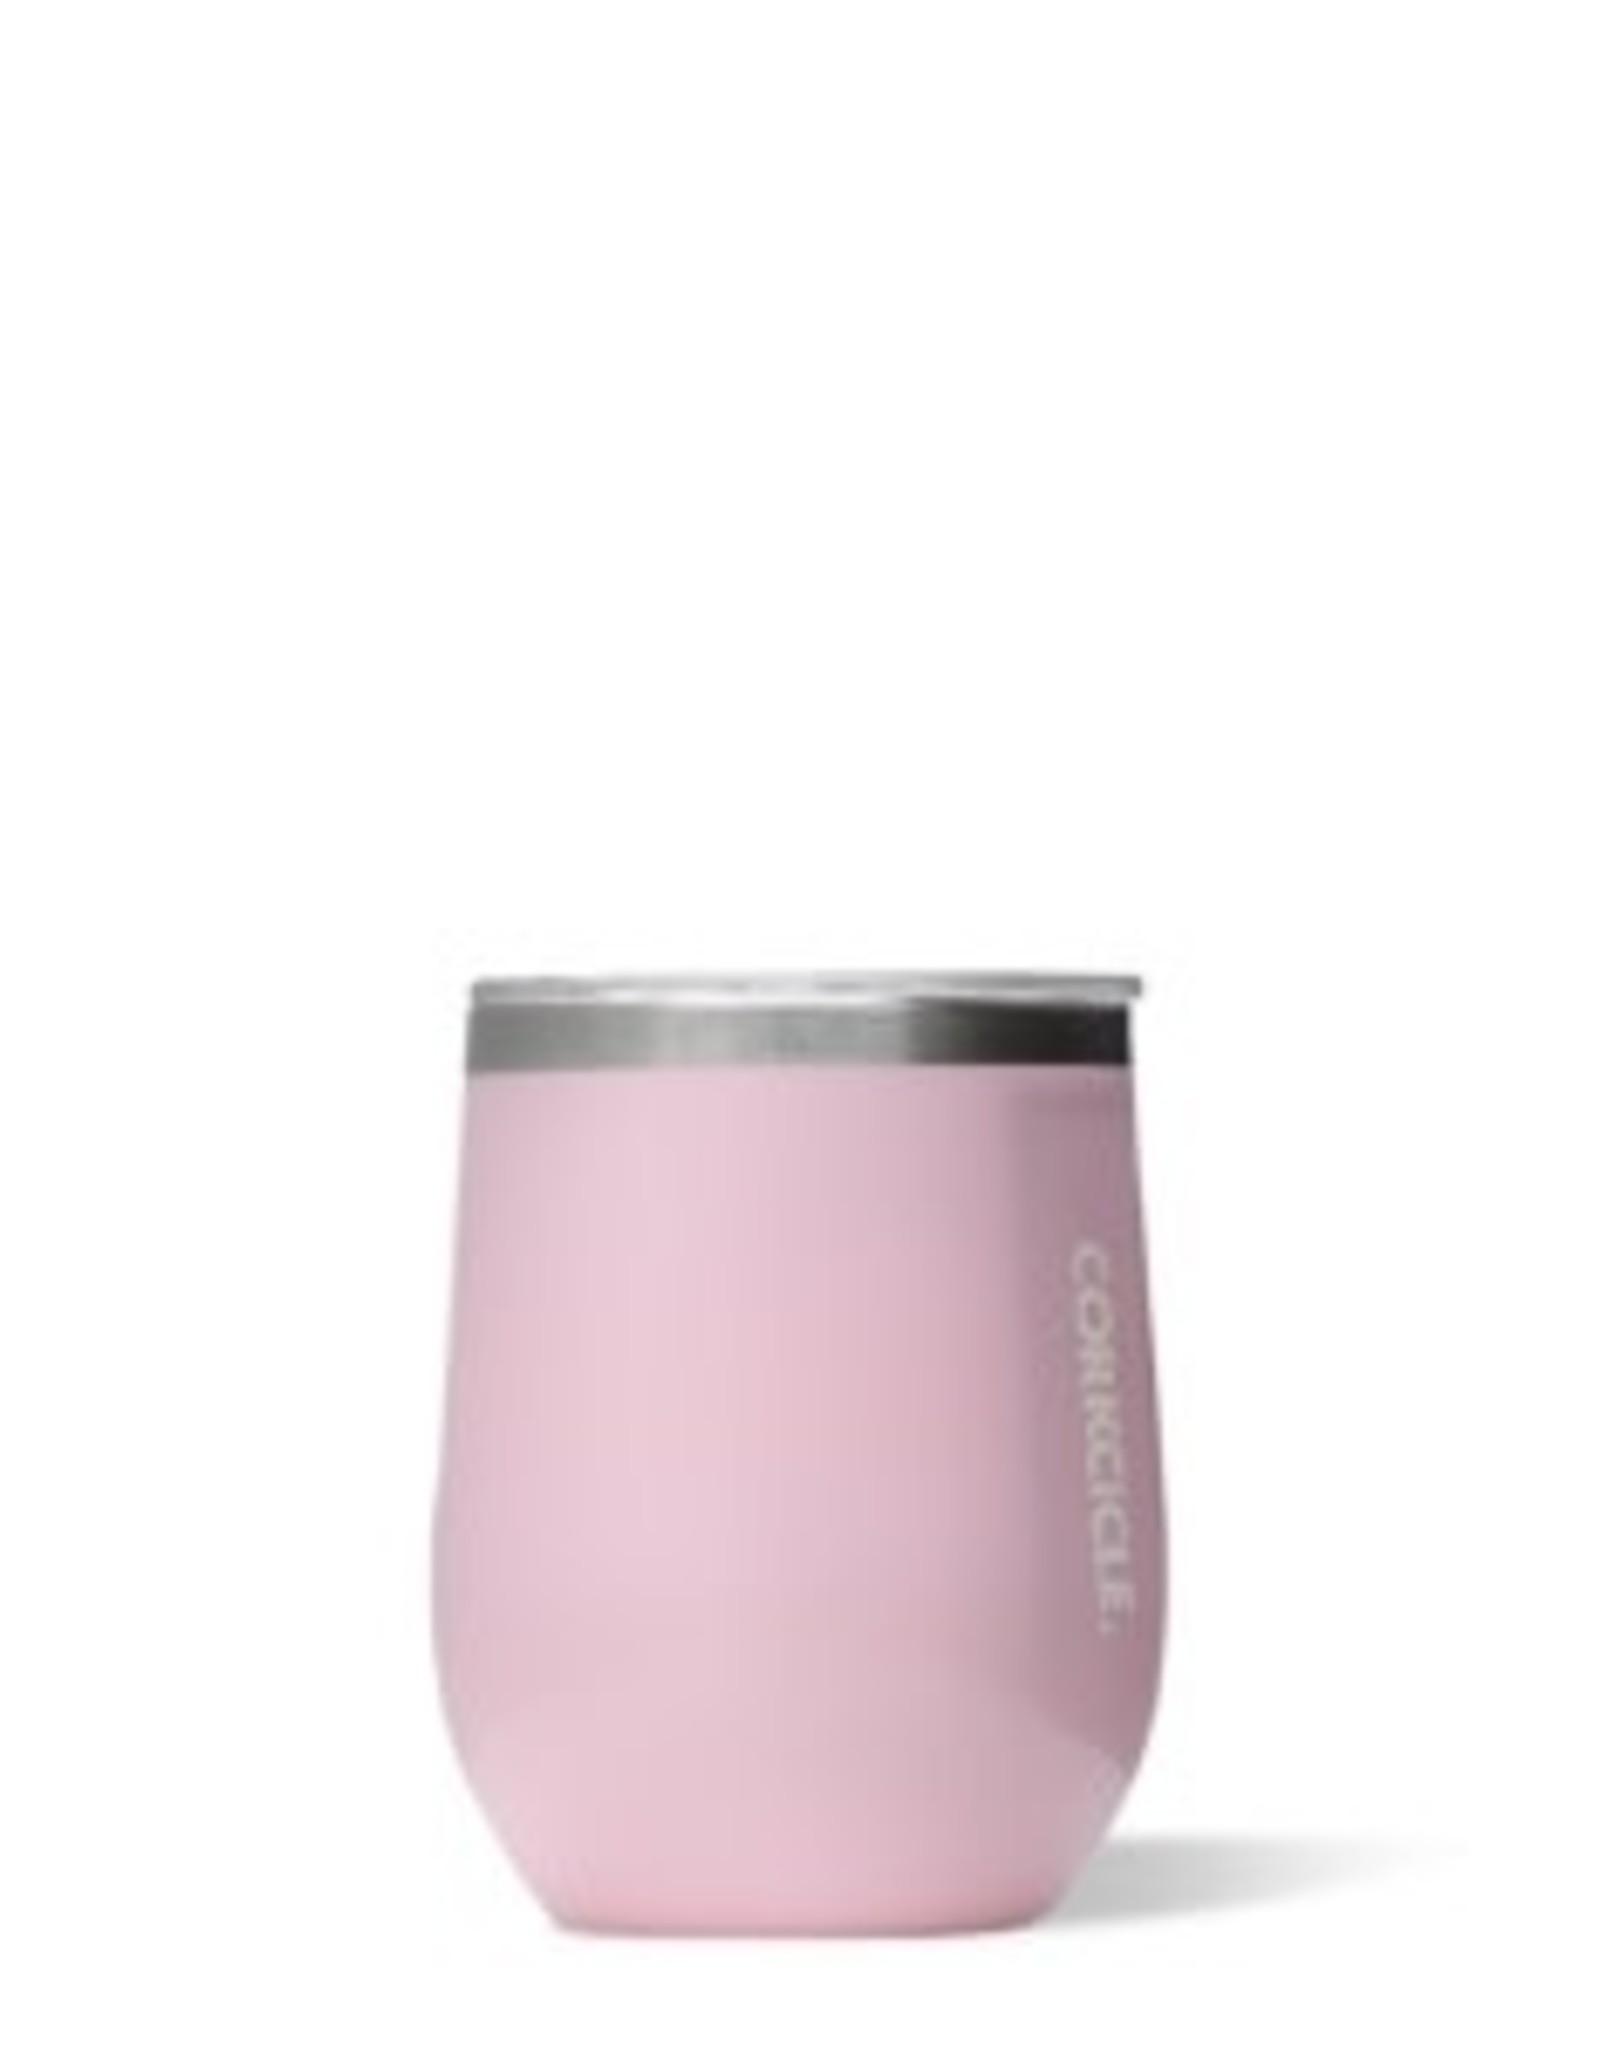 Corkcicle Stemless Wine Glass- 12oz Rose Quartz